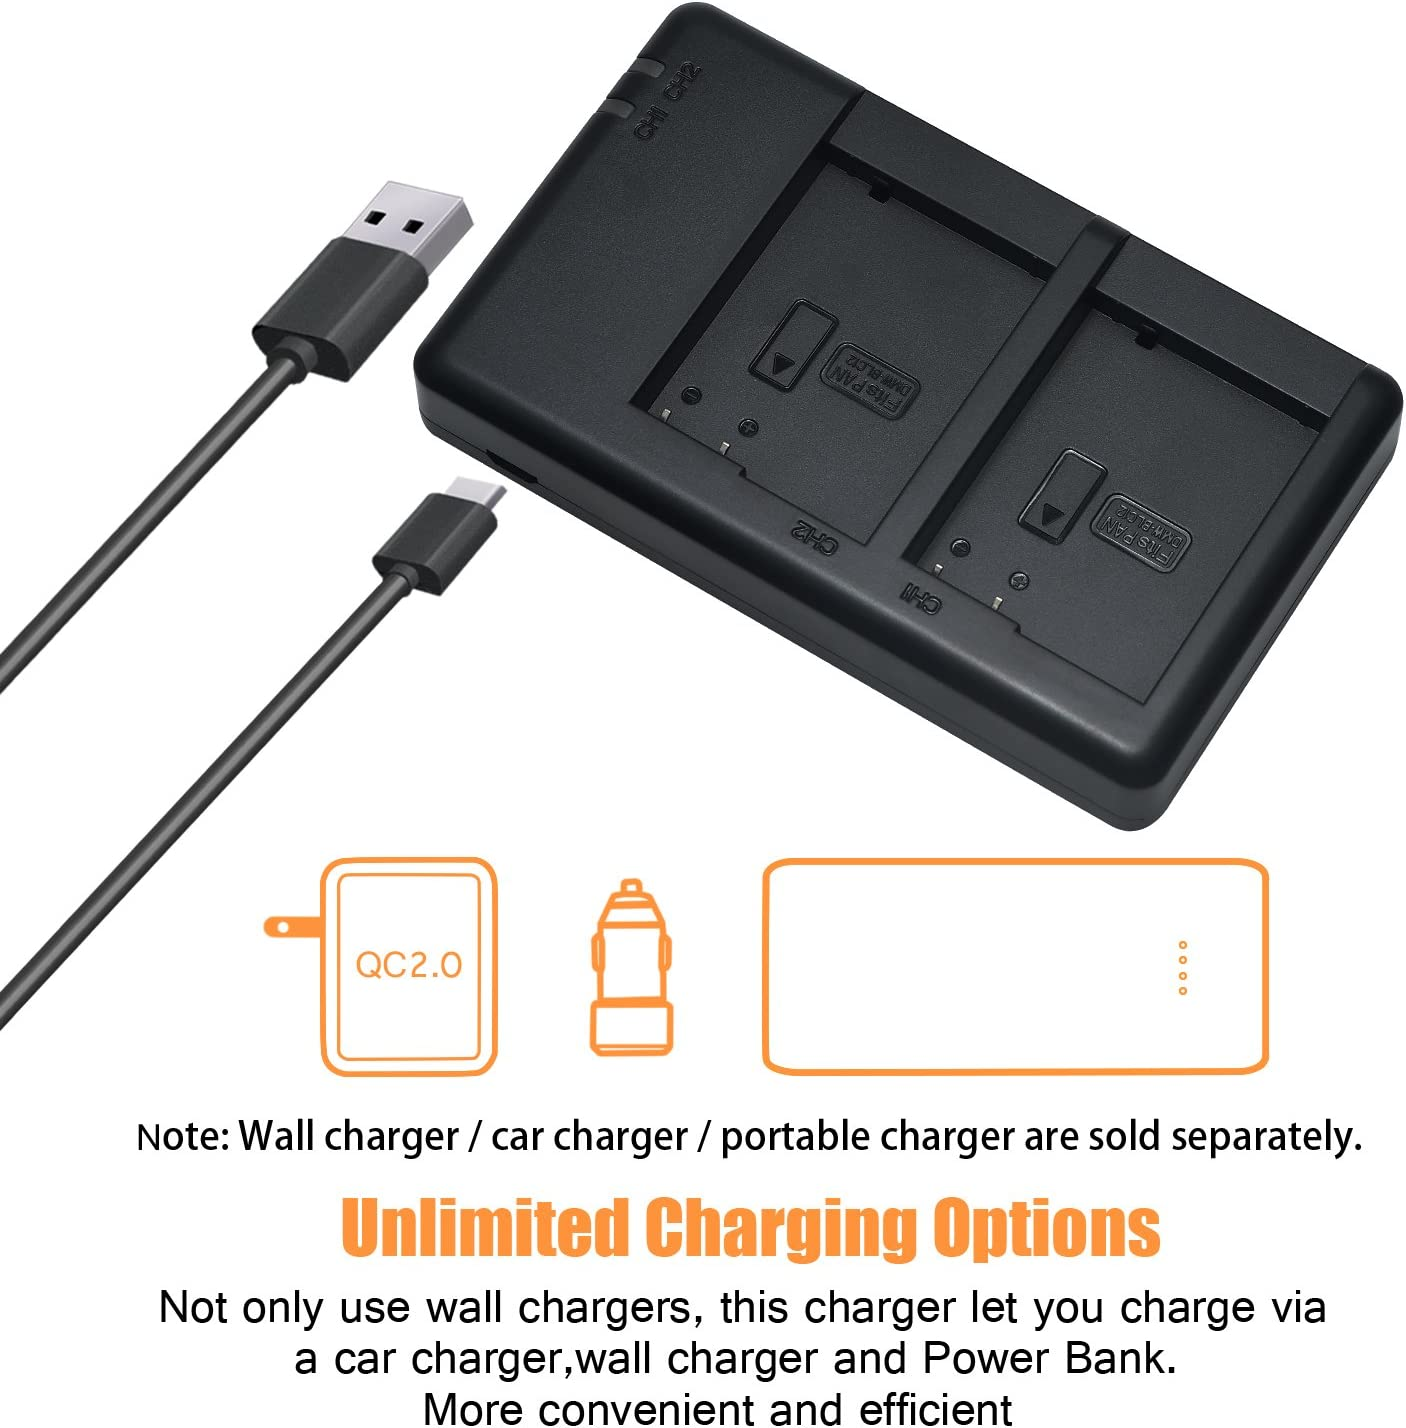 Rapid Dual Battery Charger with Micro USB Cable for Panasonic Lumix DMC-G5 G6 G7 GH2 GX8 FZ200 DMC-FZ2500 DMC-FZ2000 Leica Q Camera as DMW-BLC12E BP-DC12E DSTE 2X DMW-BLC12 Battery